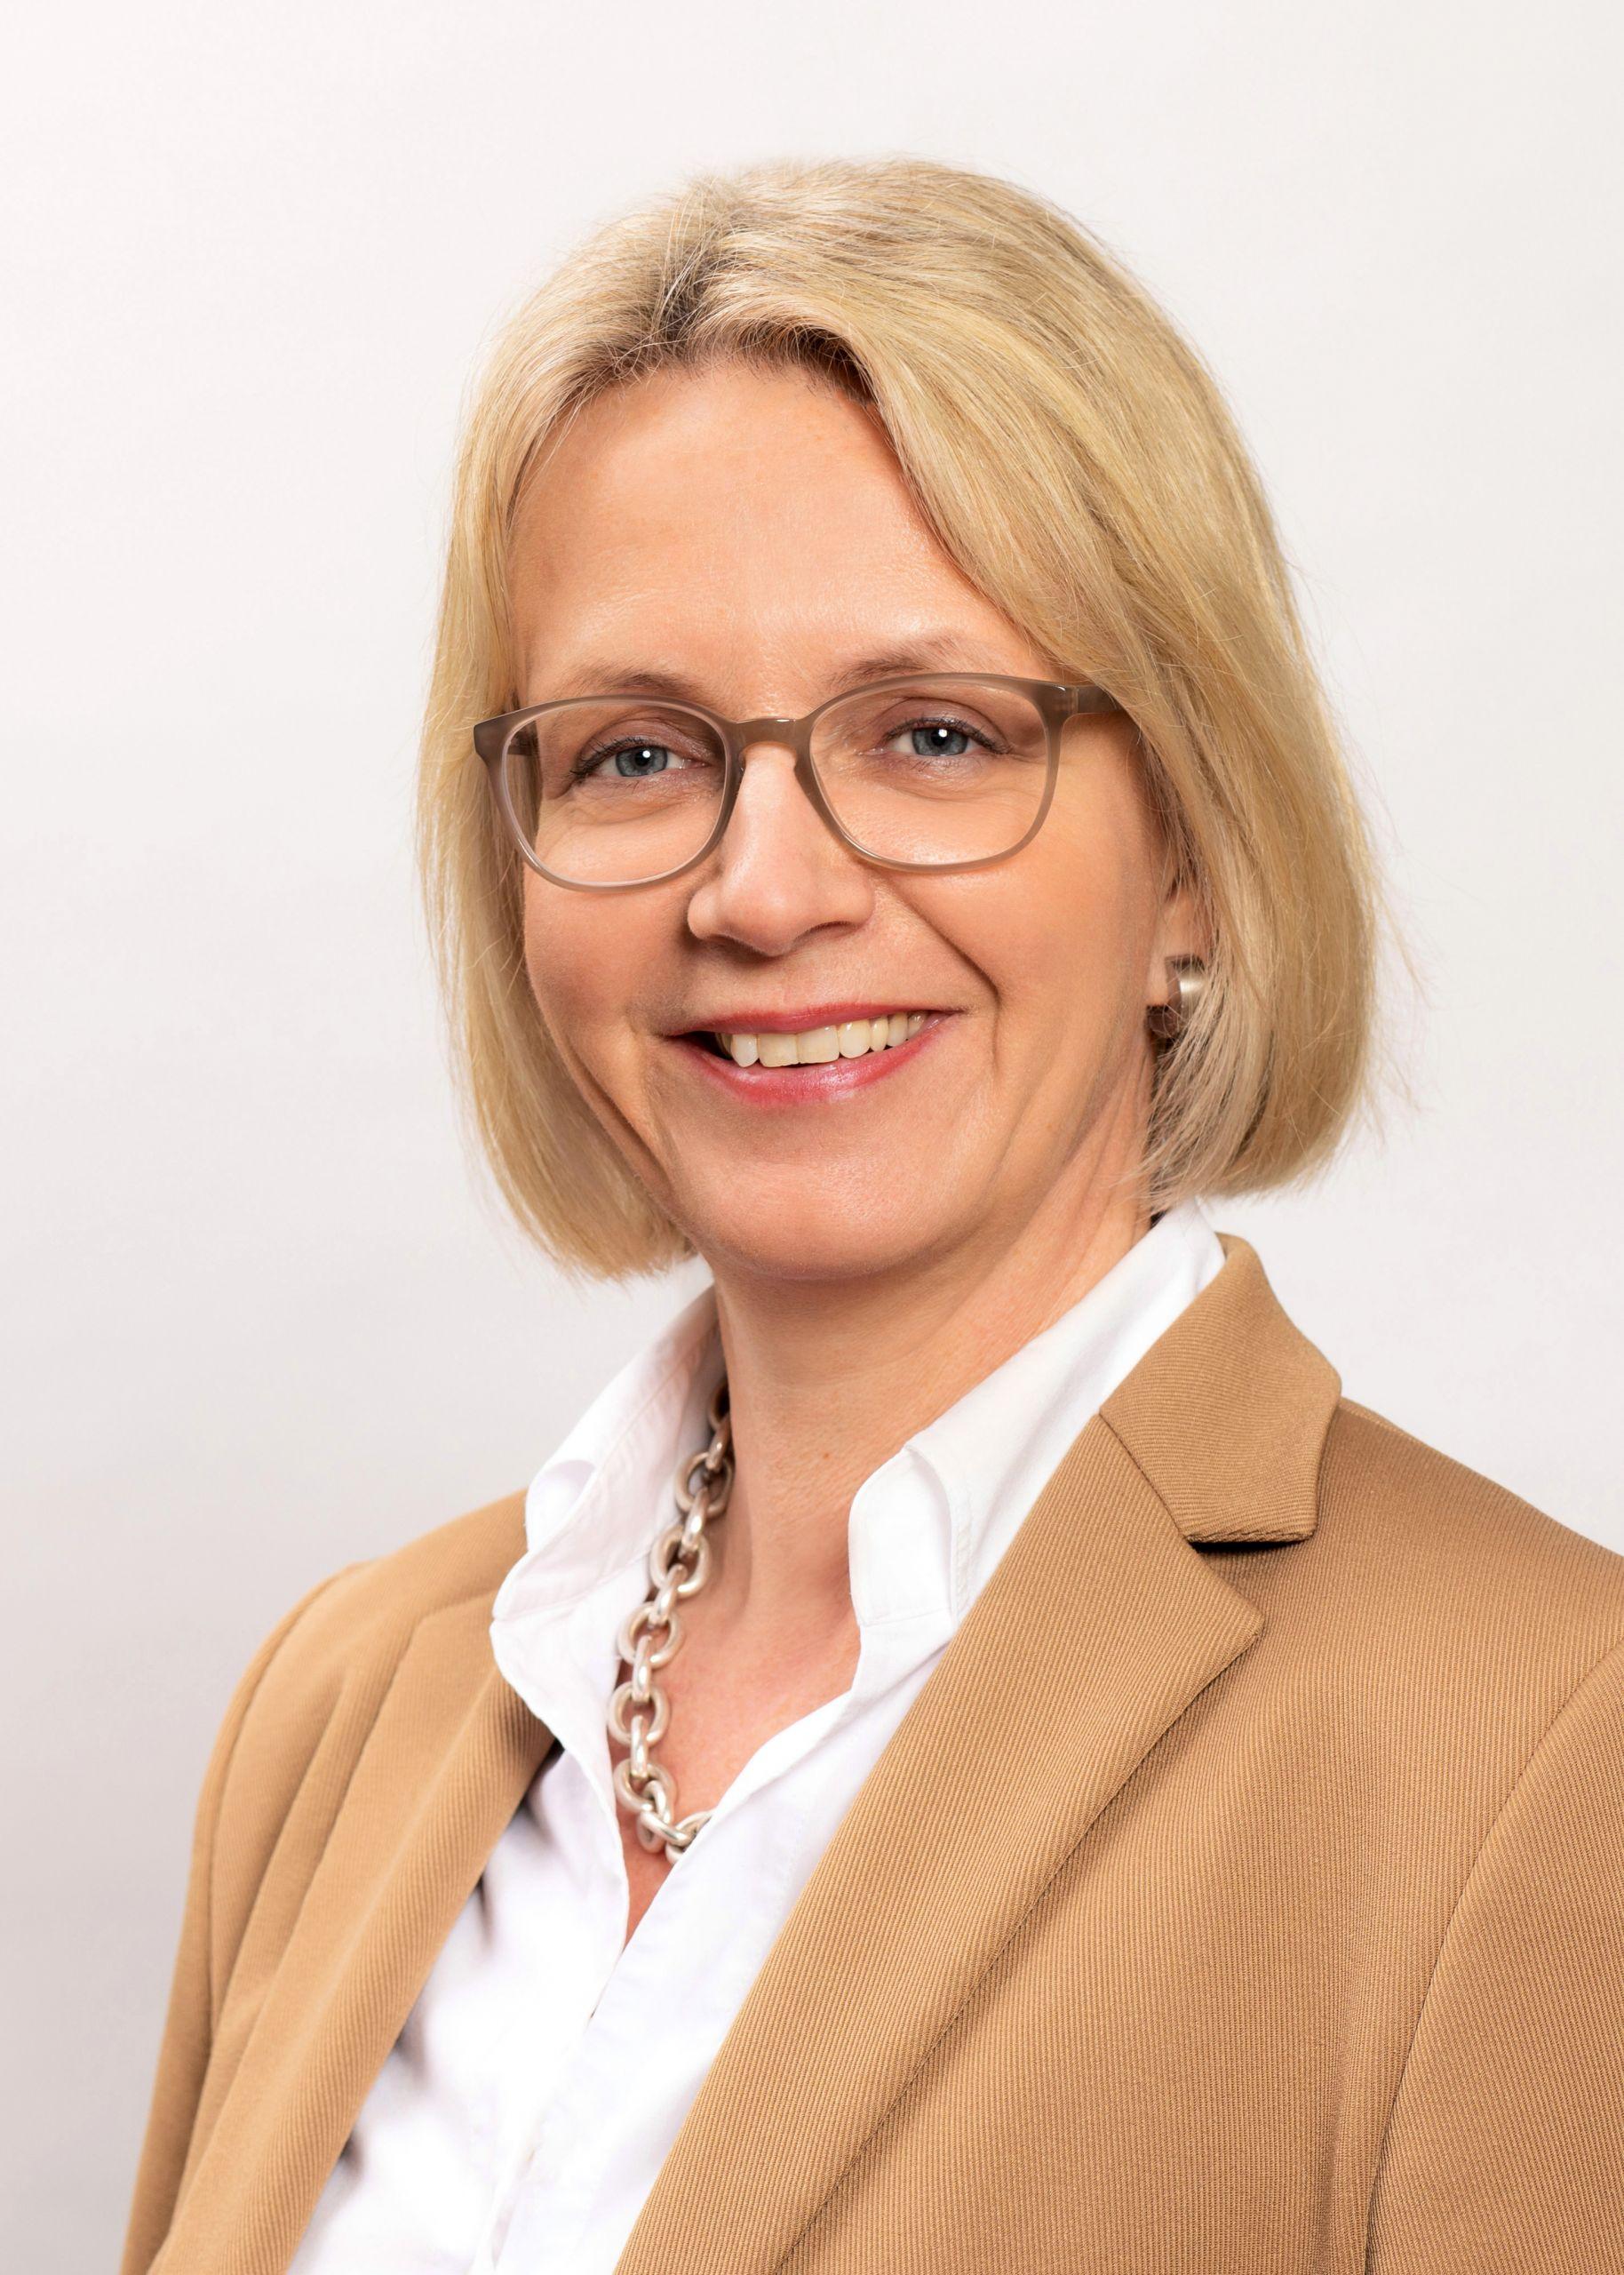 Nicole Schuffert